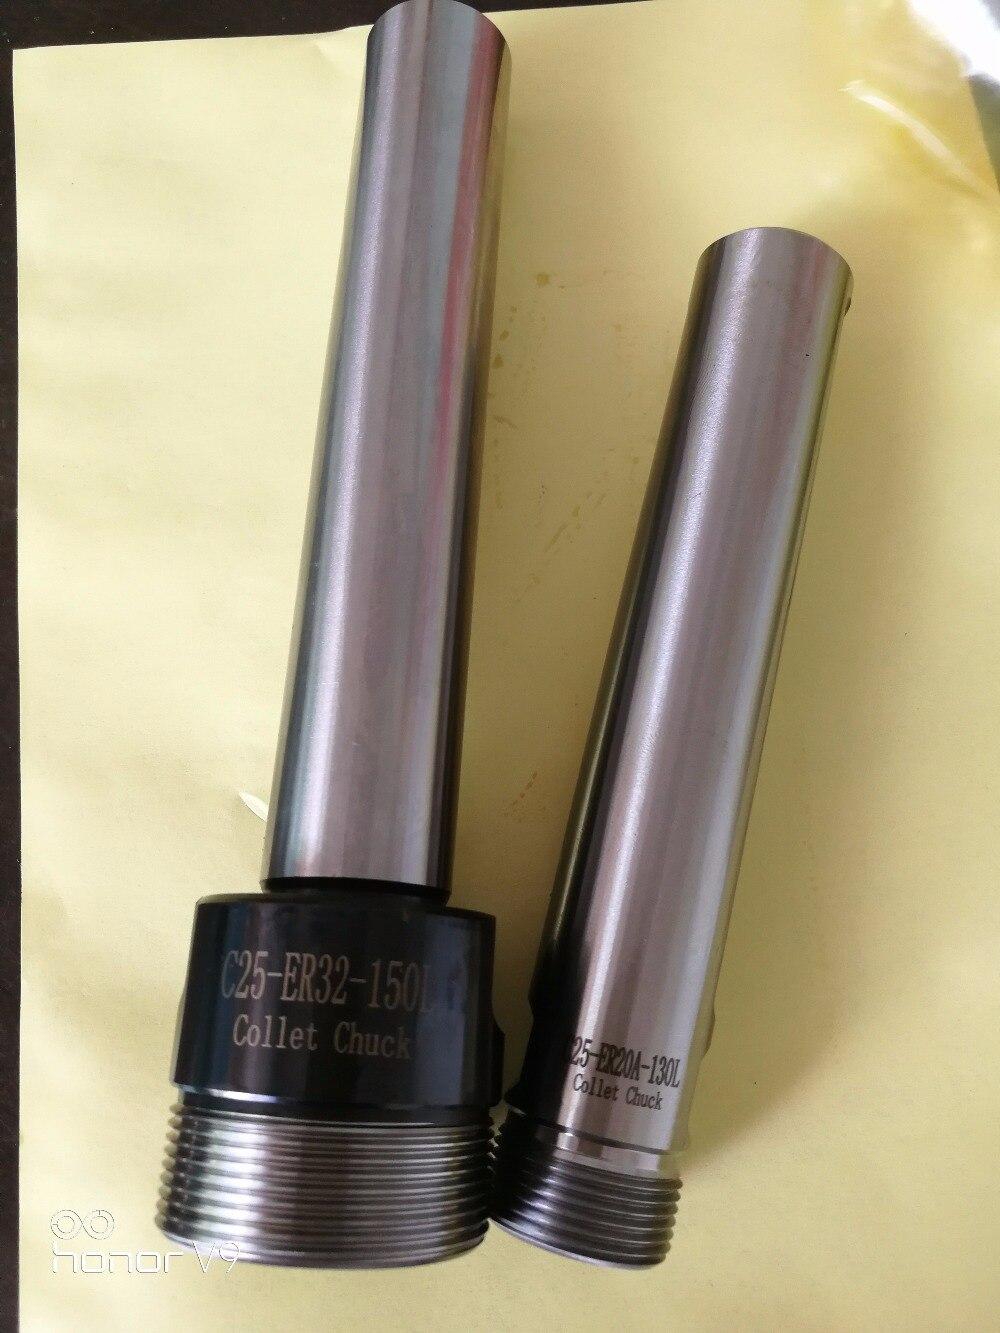 Купить с кэшбэком New 1pcs C25 ER20A 130L M10 Straight shank collet chuck 25mm extension toolholder ,M10 thread drawbar  CNC mill